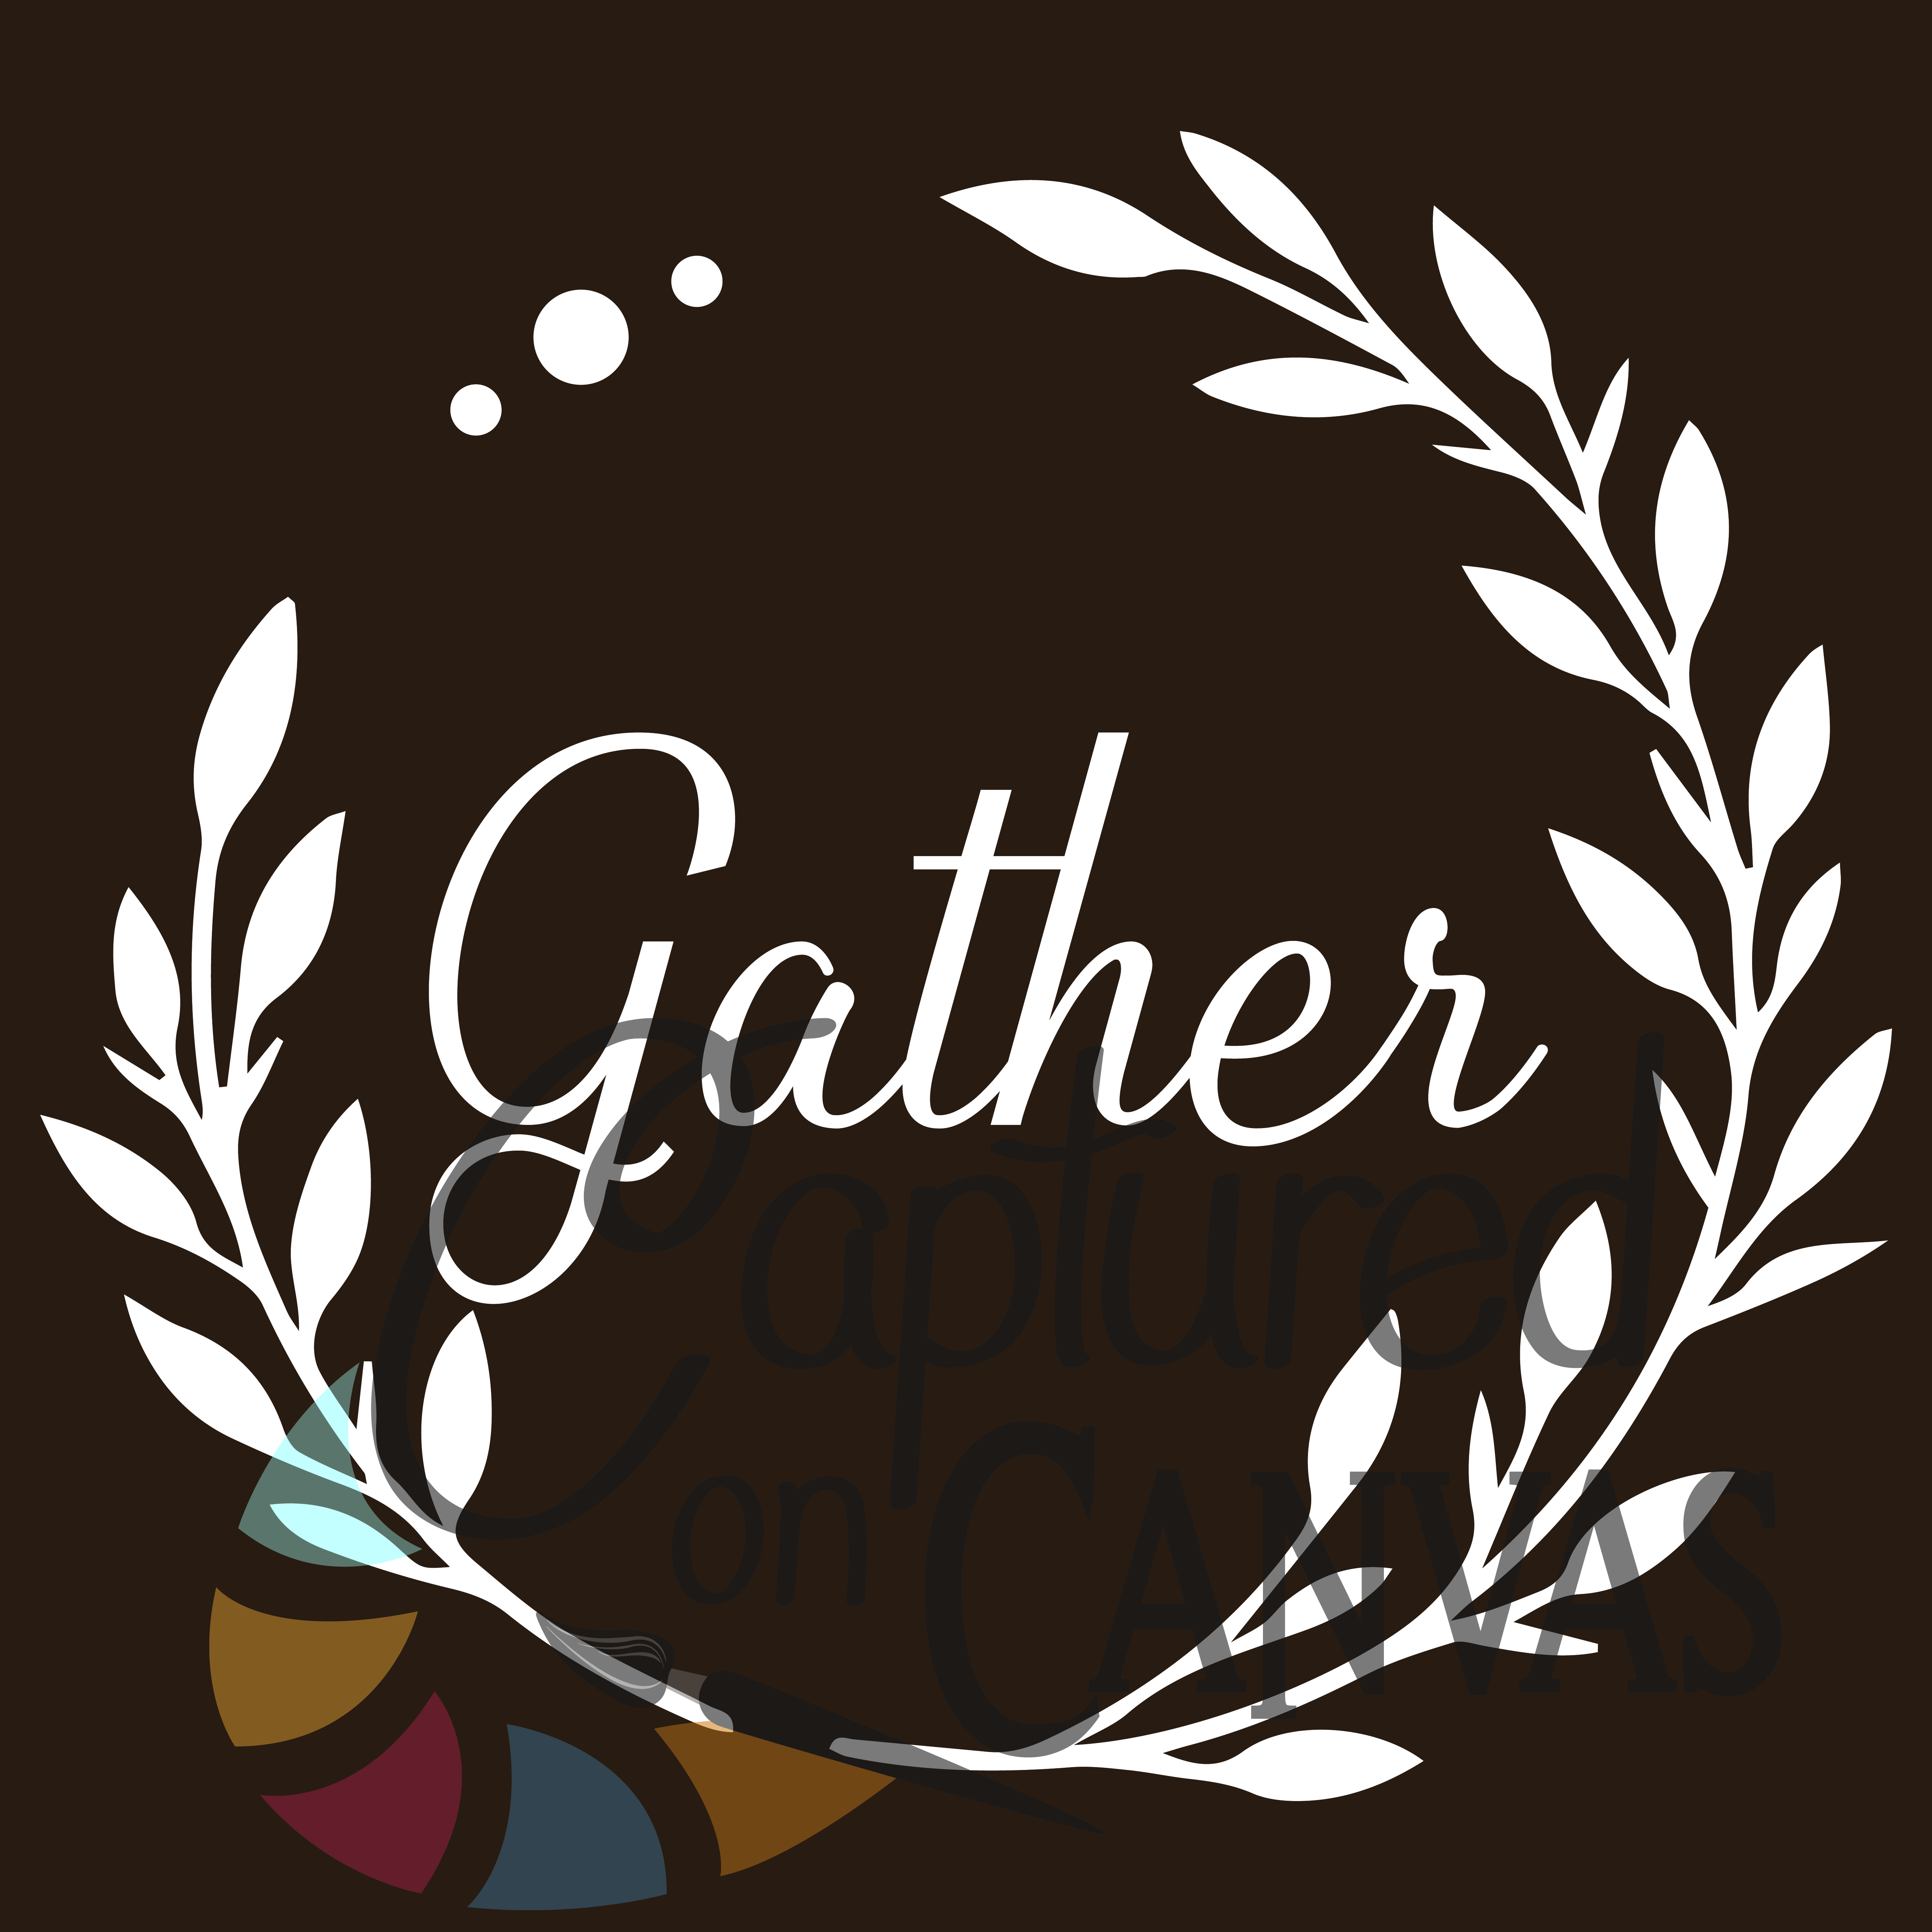 Gather Square 1